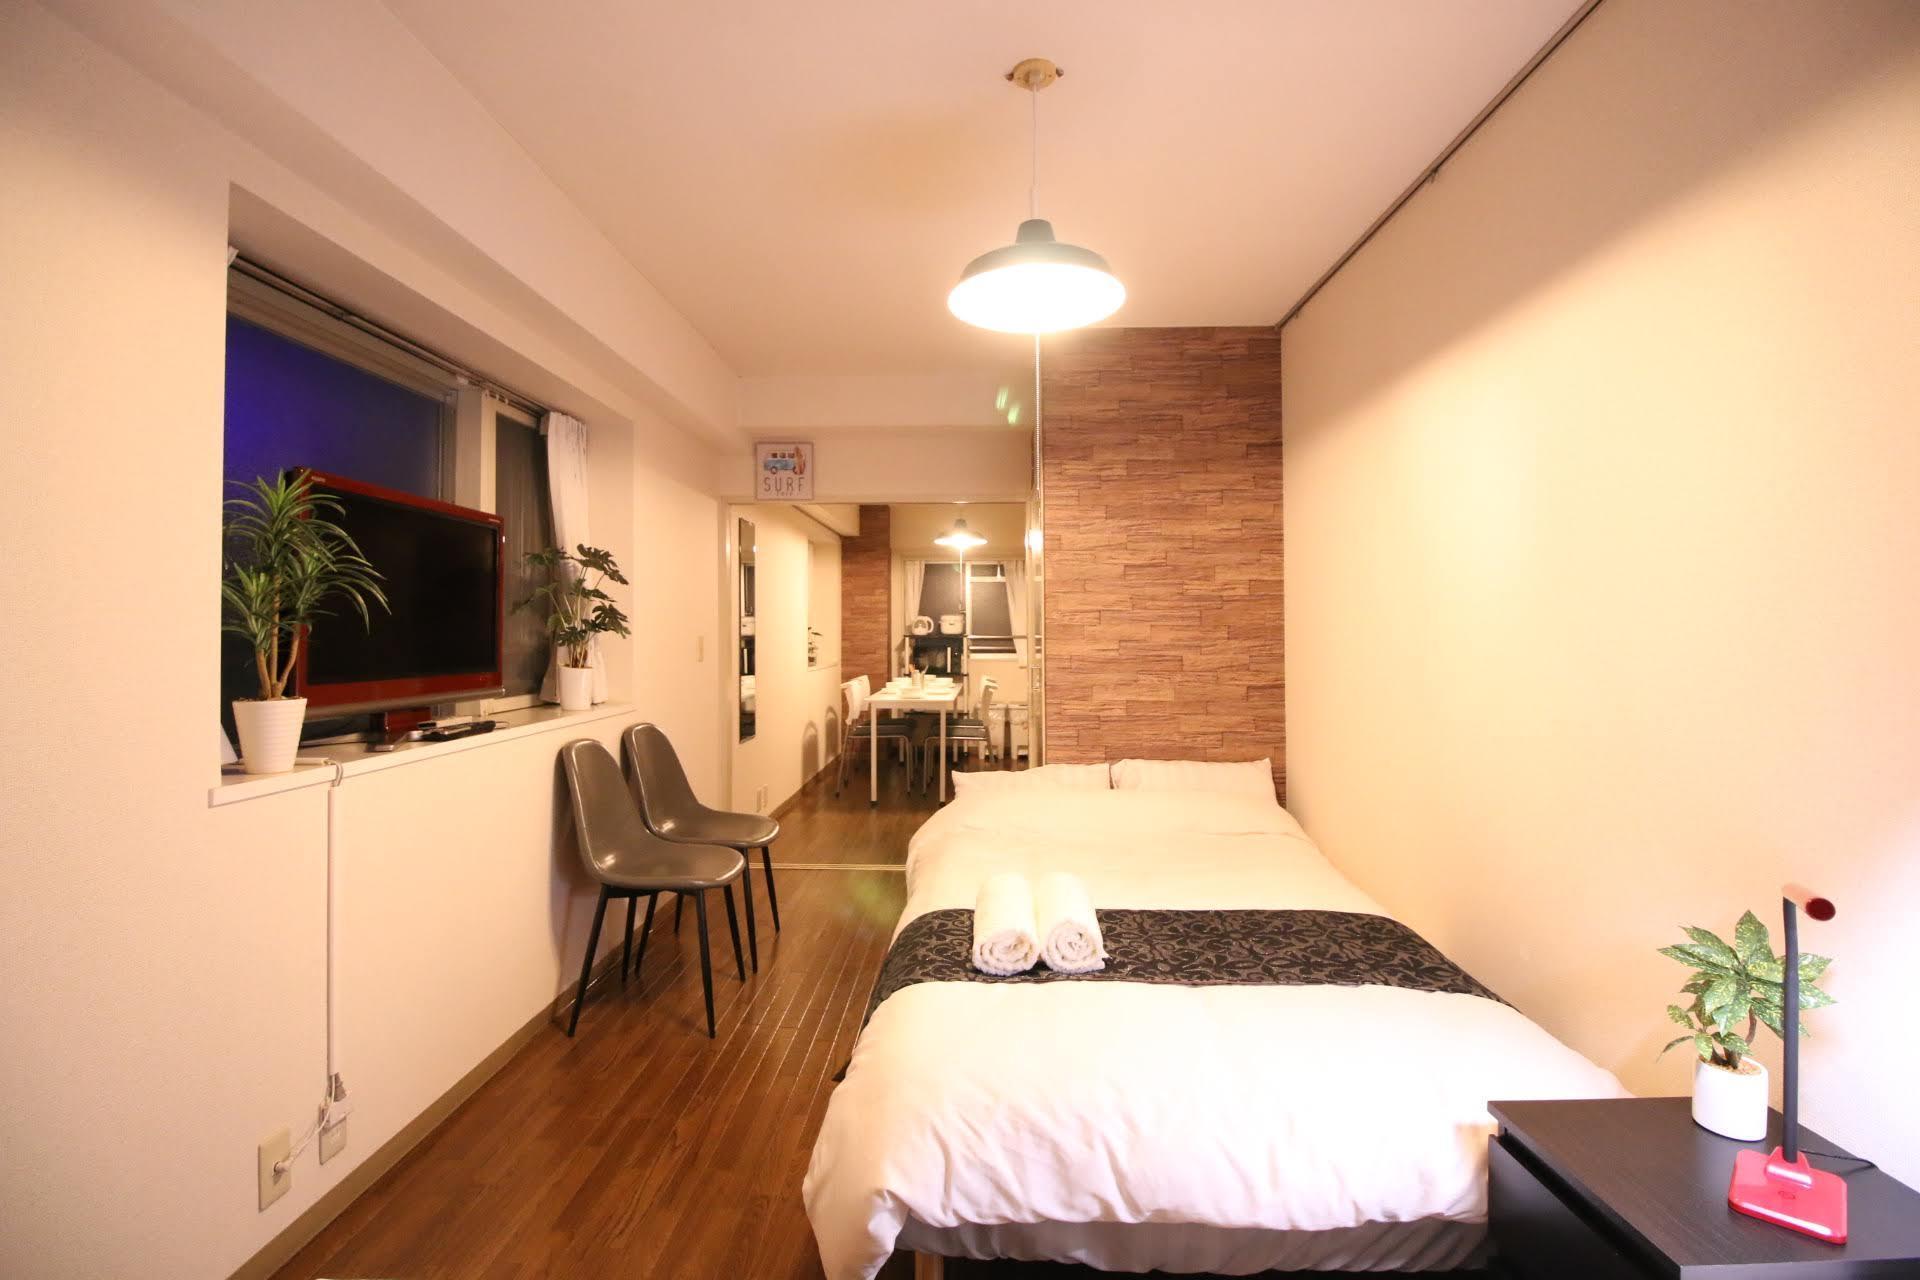 MG5. Cozy And Clean Room SHINAGAWA